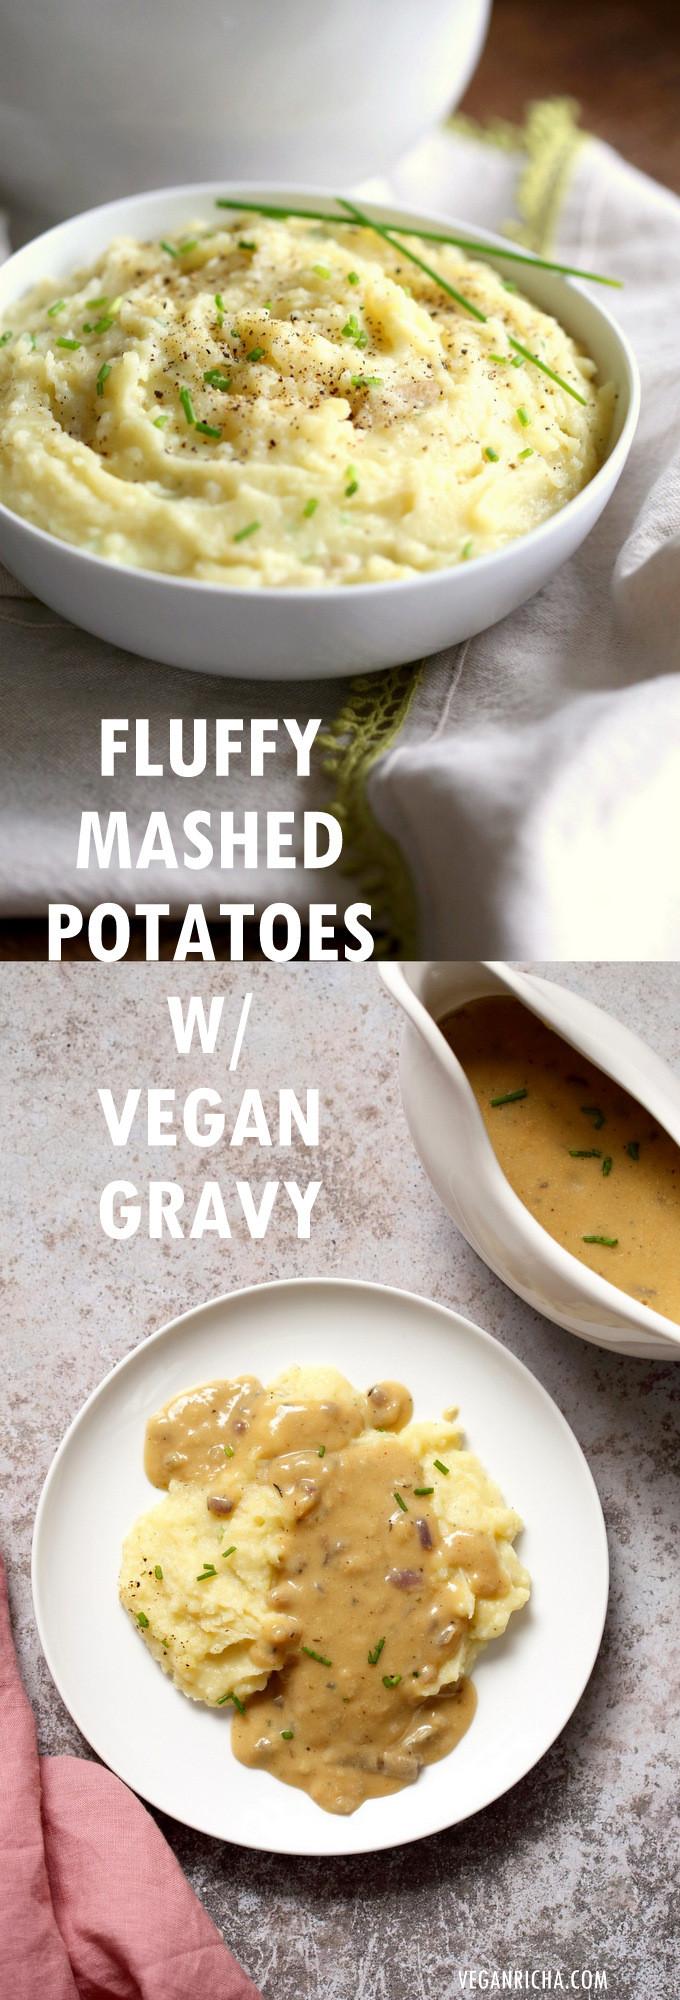 Vegetarian Gravy Recipe For Mashed Potatoes  ve arian gravy recipe for mashed potatoes